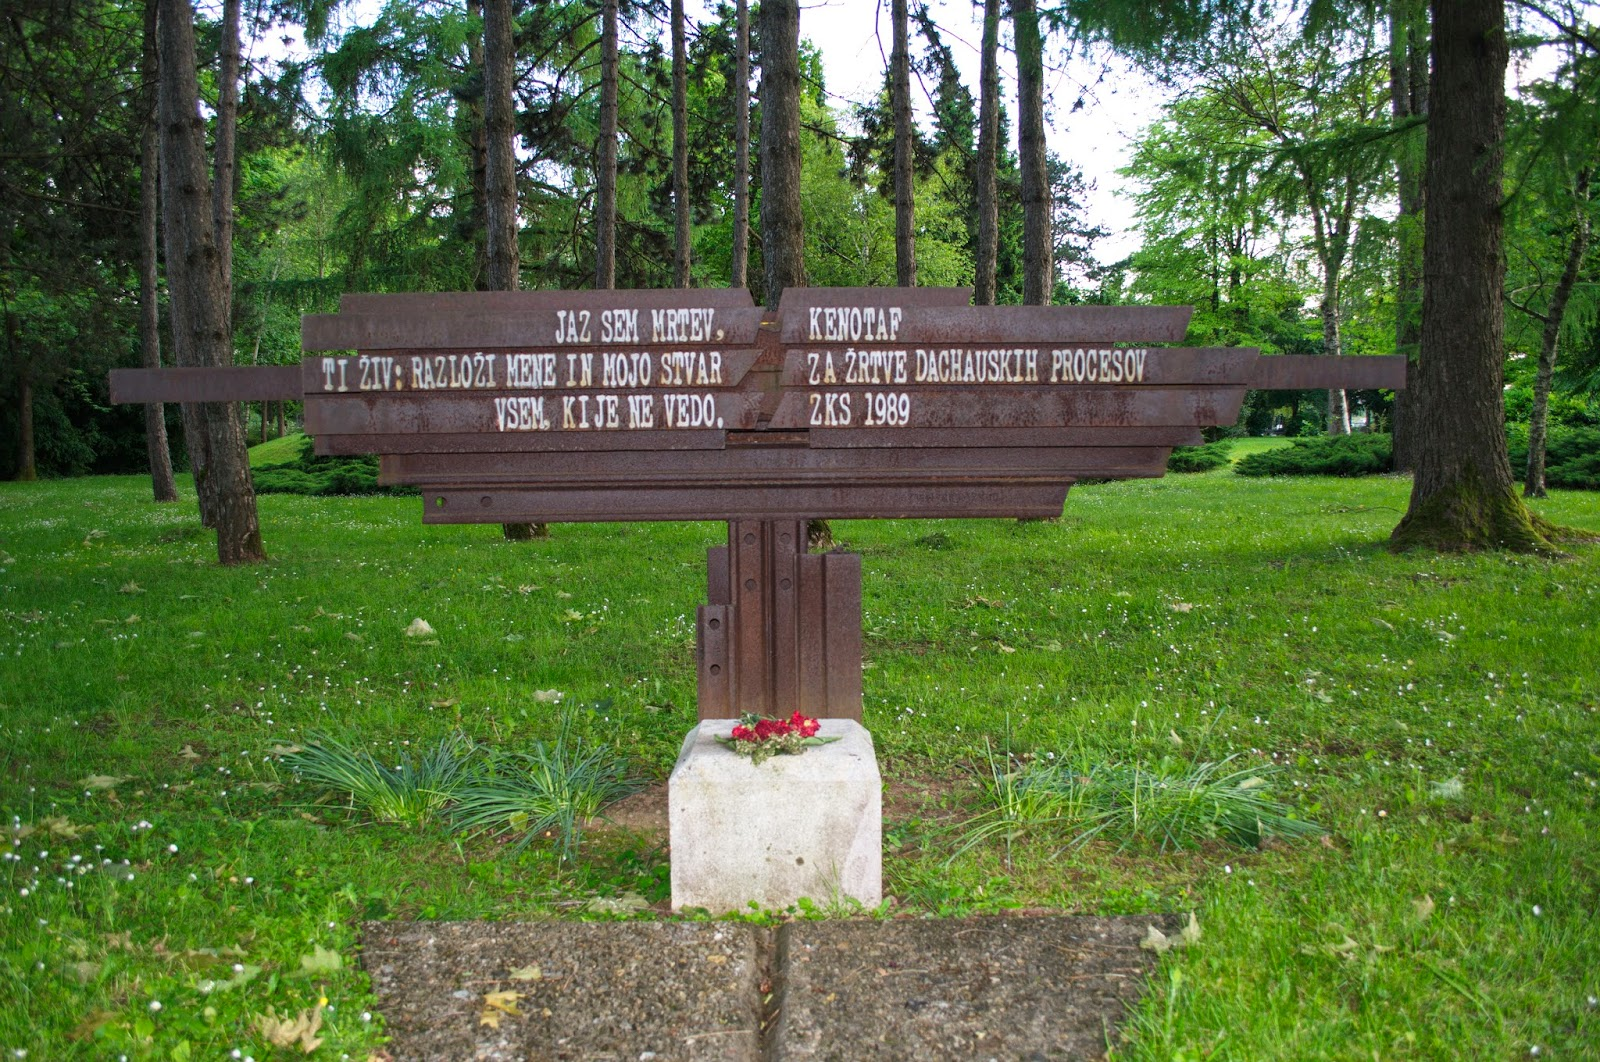 Spomenik žrtvam dachauskih procesov